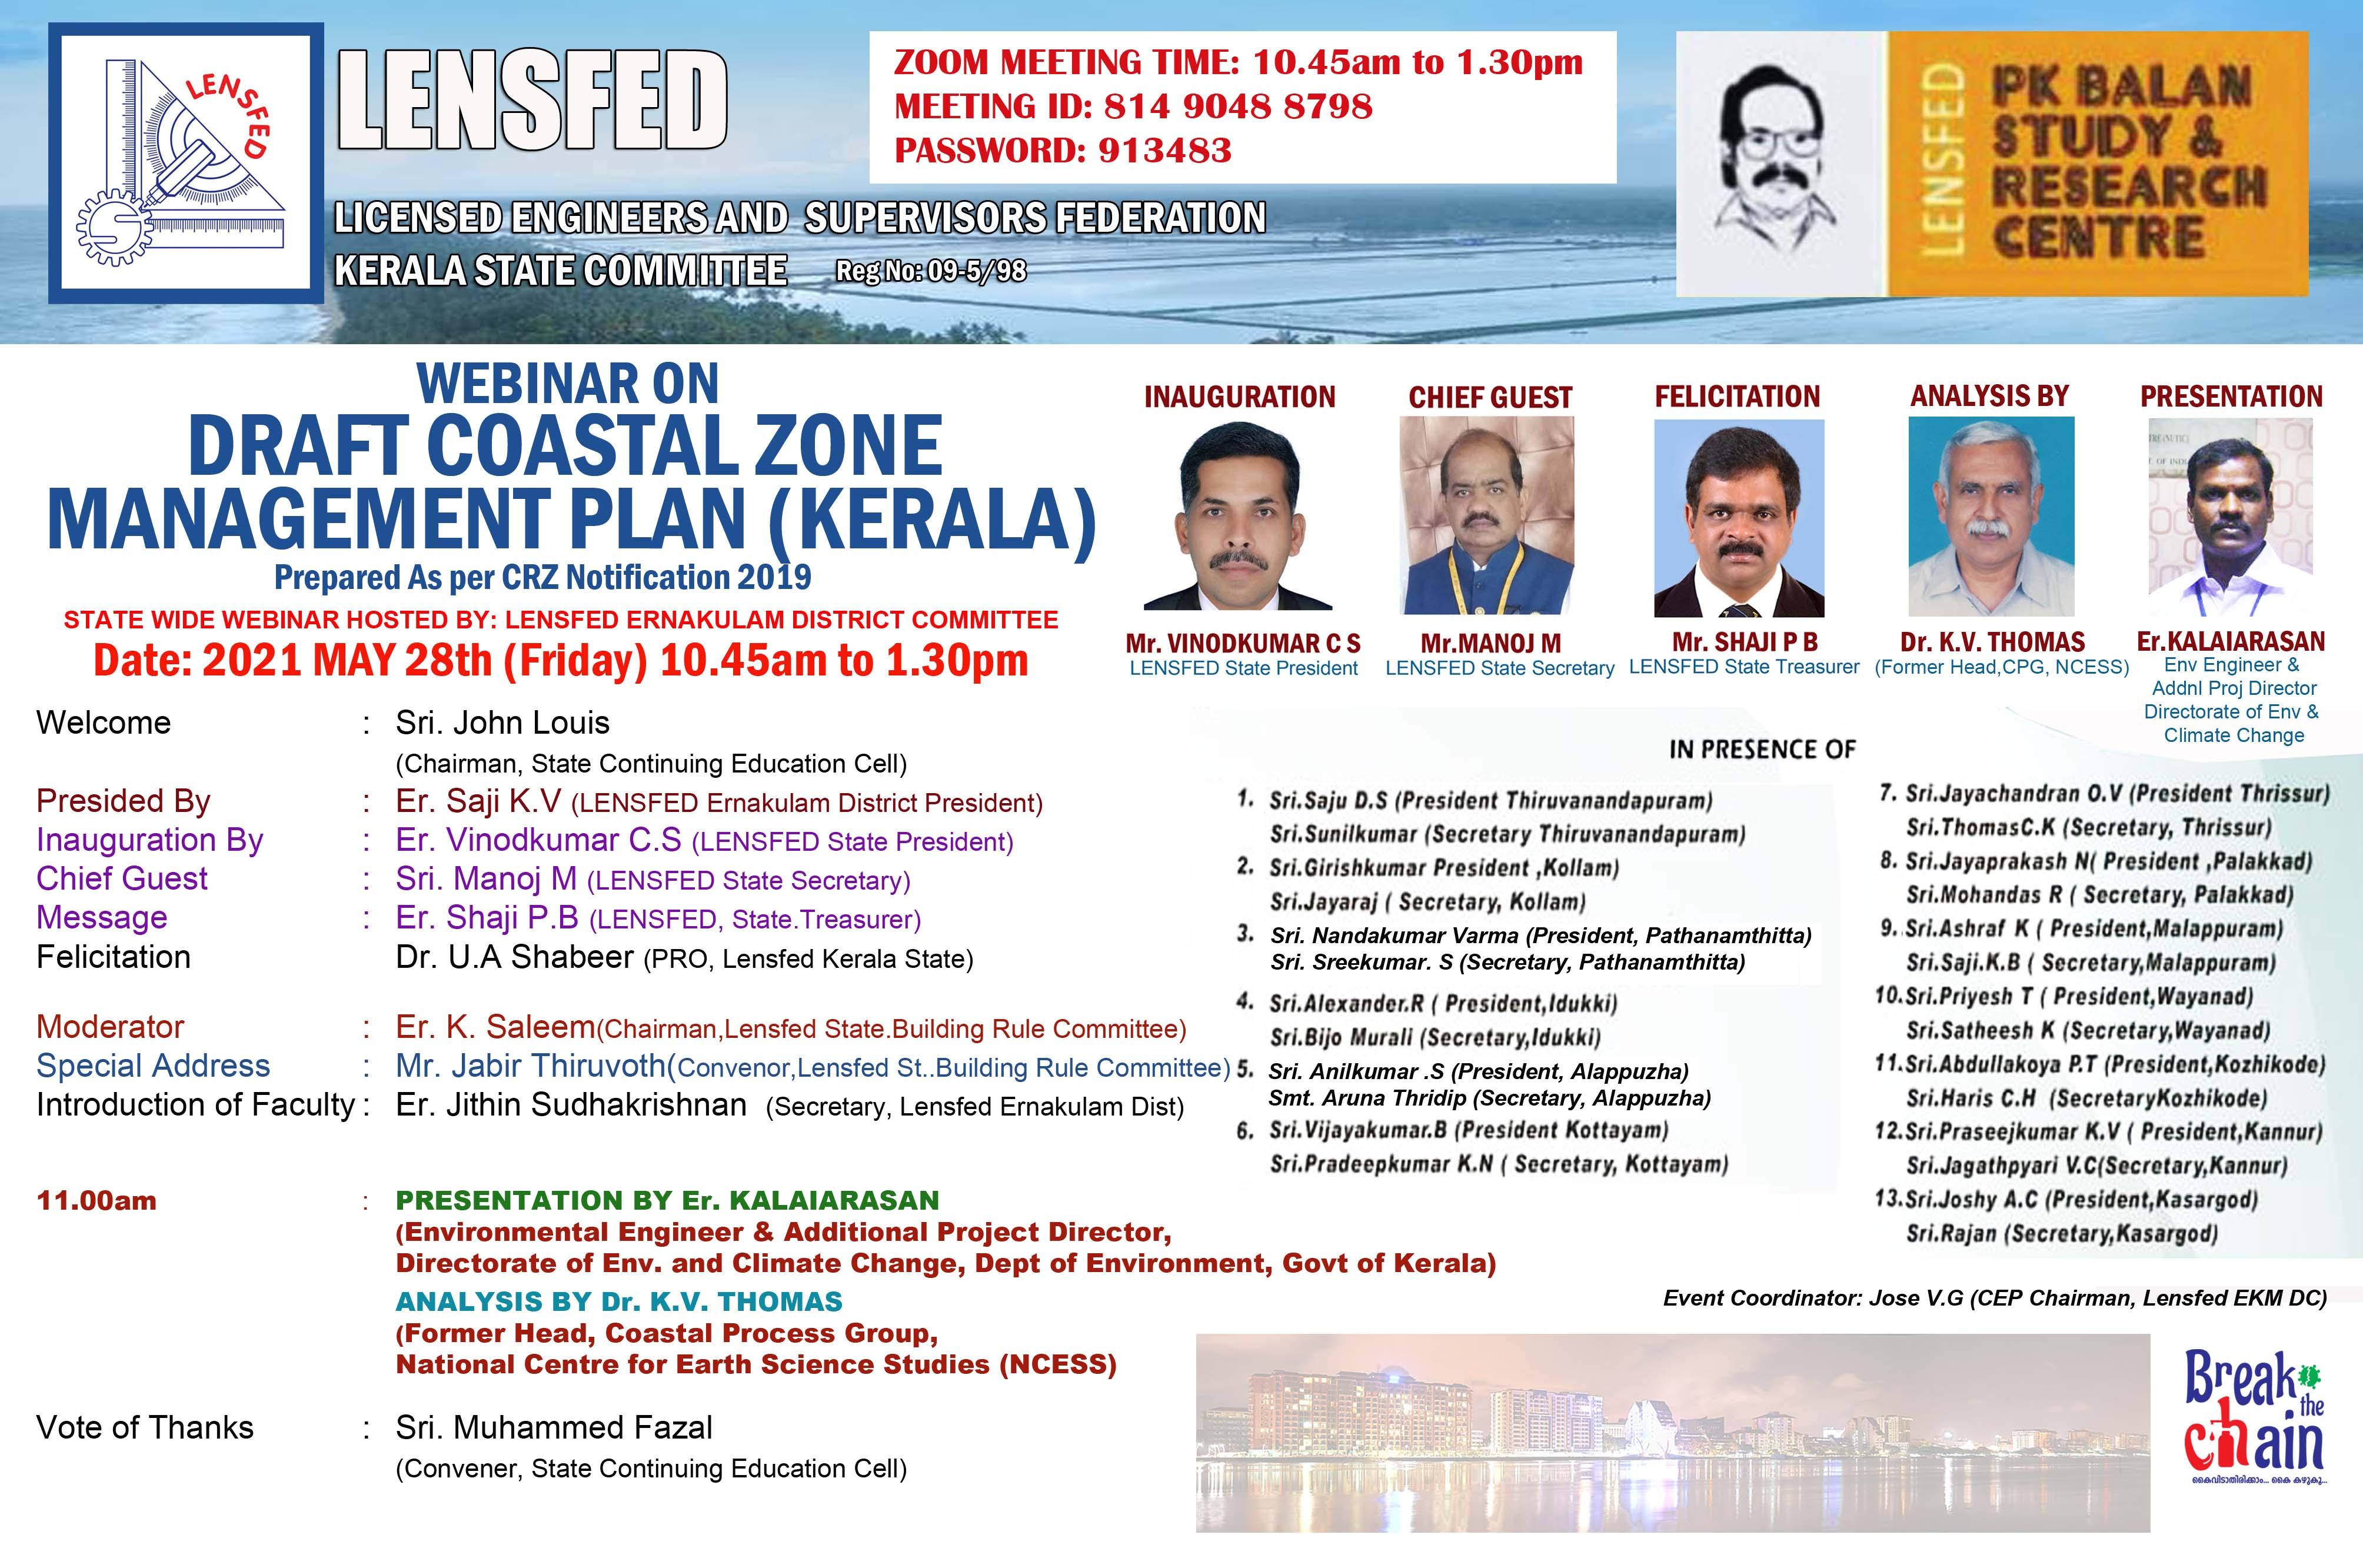 WEBINAR ON DRAFT COASTAL ZONE MANAGEMENT PLAN (KERALA)